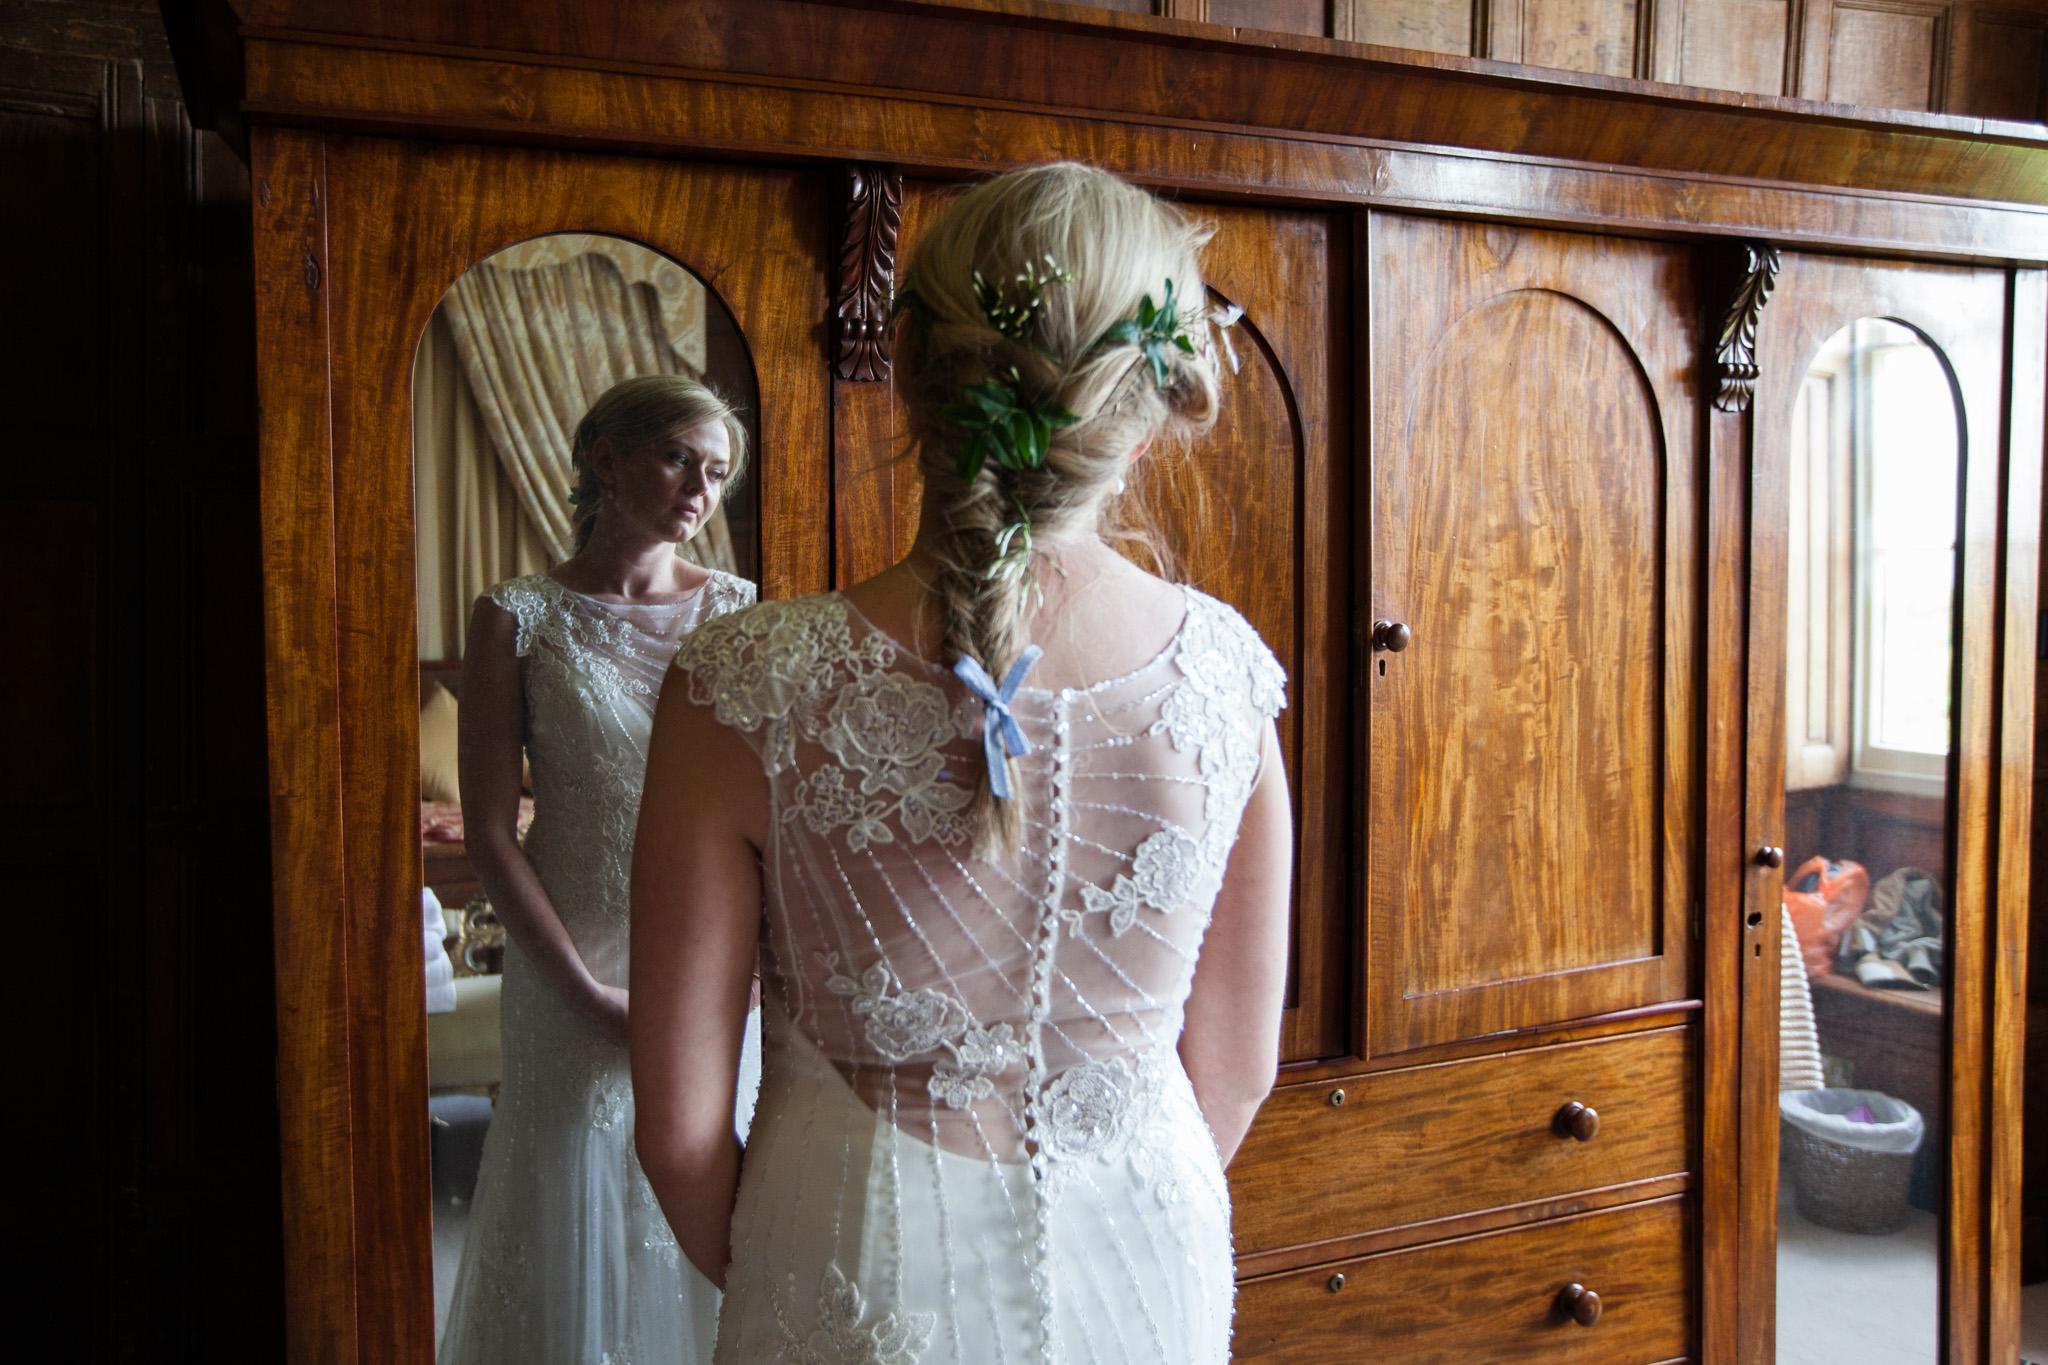 Mark_Barnes_Gloucester_Wedding_Photographer_Elmore_Court_Wedding_Photography_Mike+Kelly-22.jpg